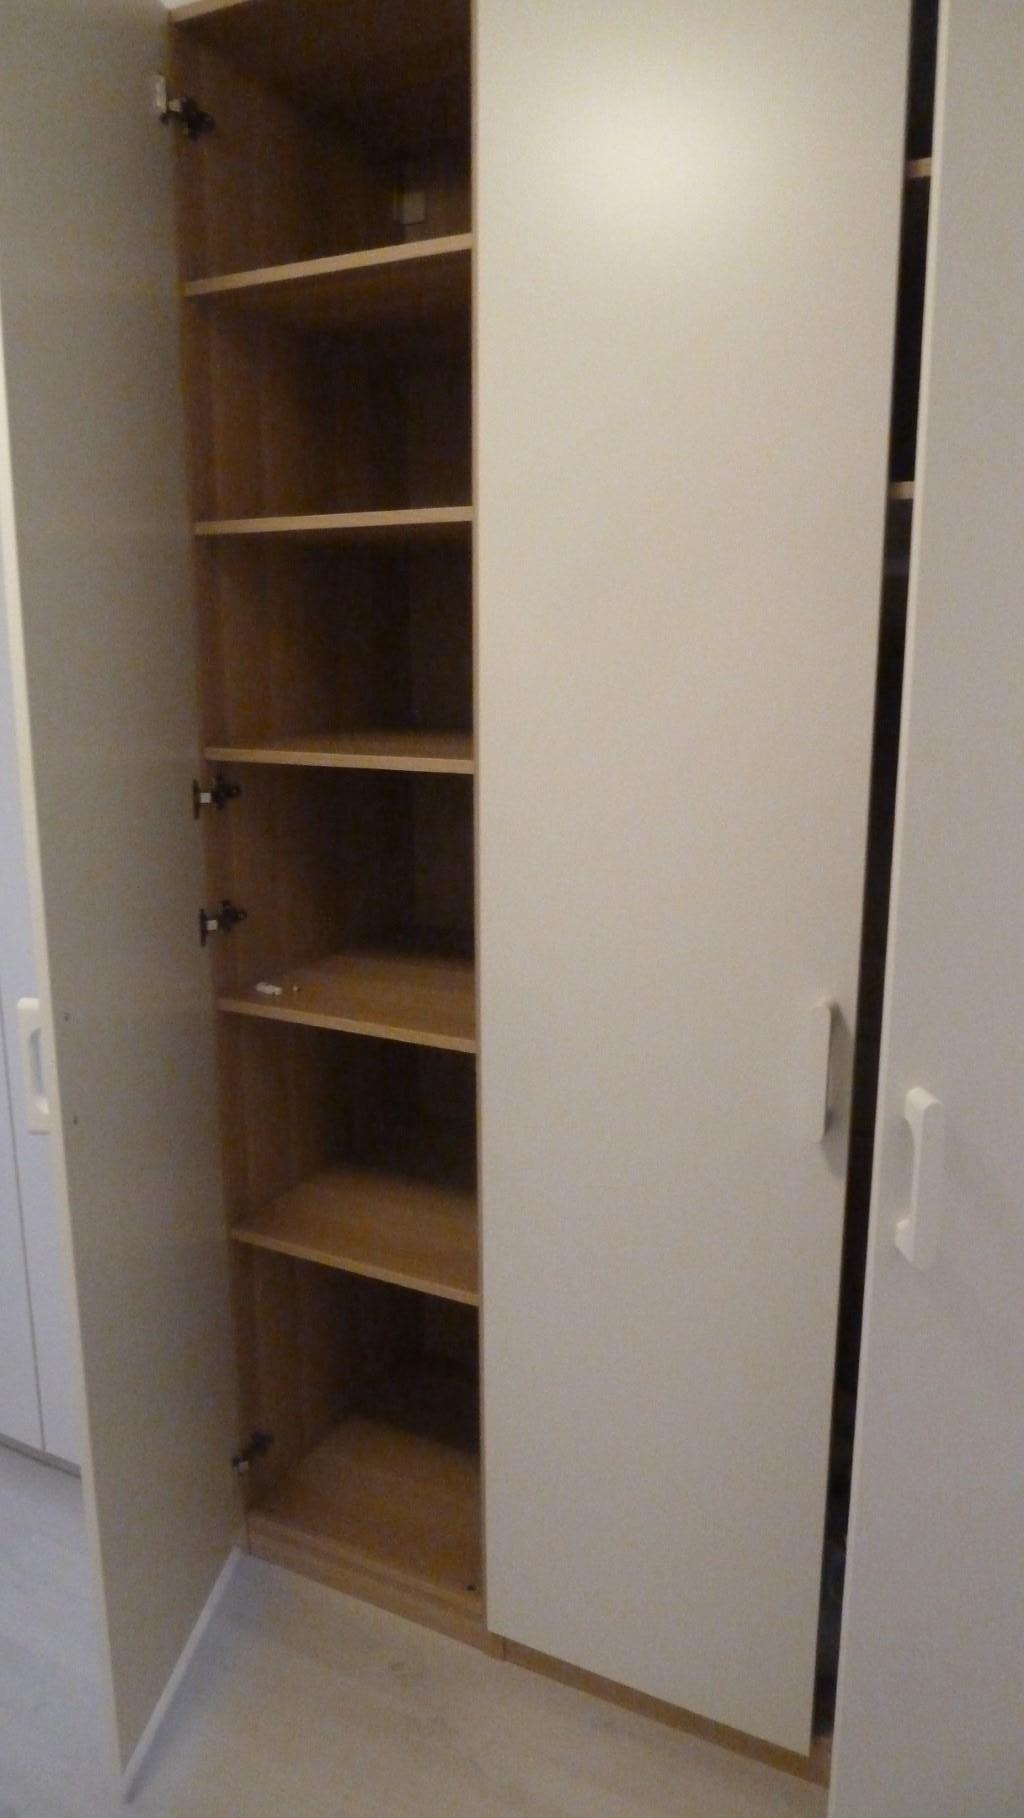 Appartement - Zaventem Sint-Stevens-Woluwe - #3970084-11